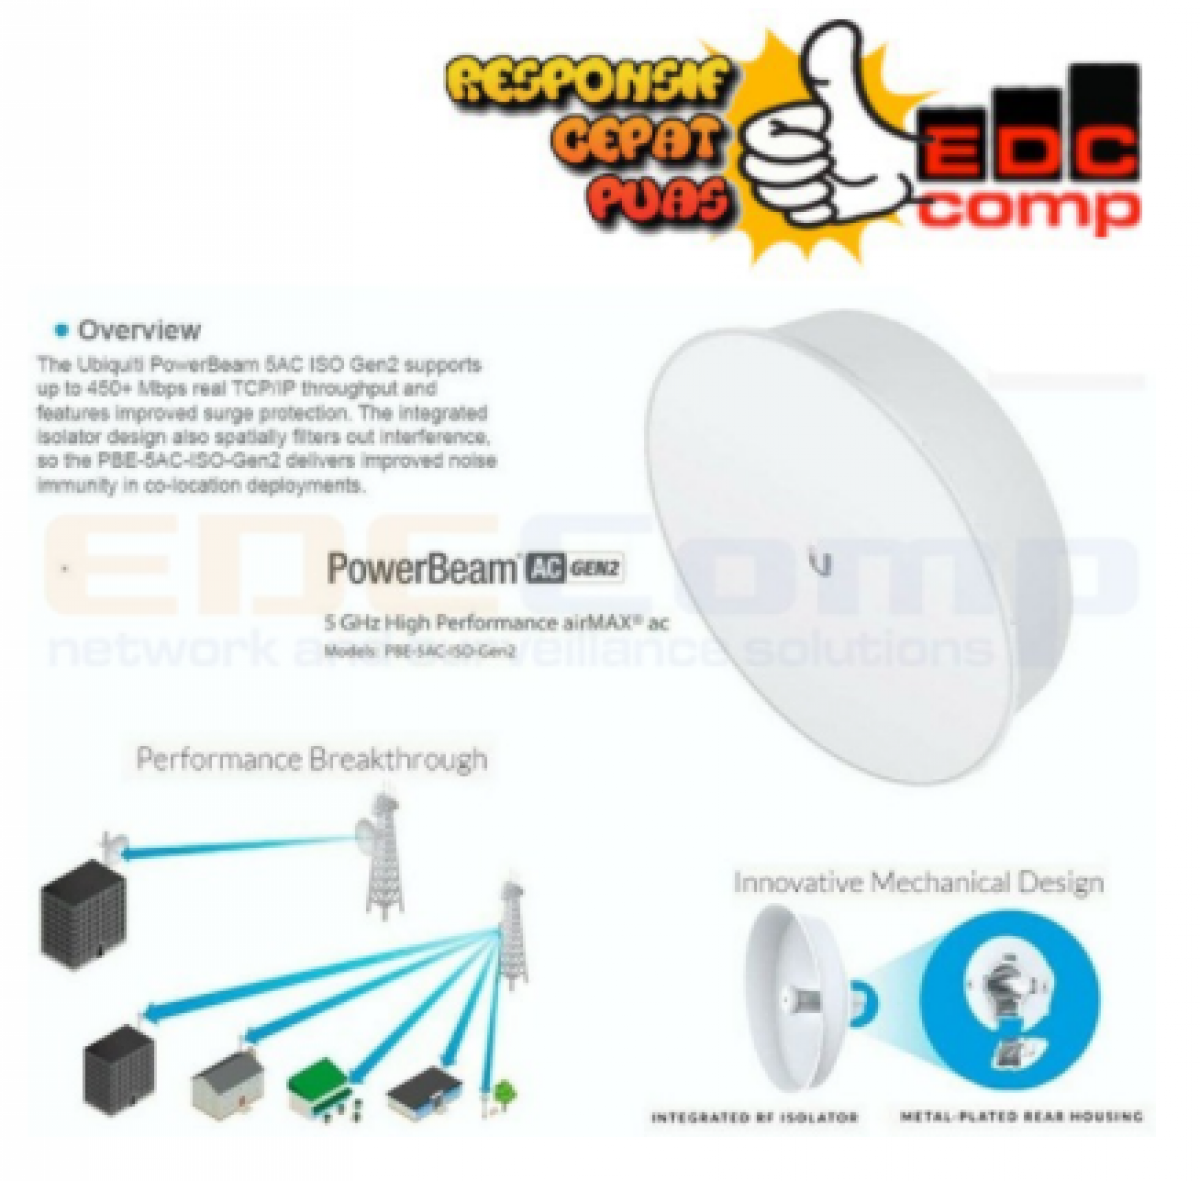 UBIQUITI PBE-5AC-ISO-Gen2 Powerbeam Gen 2 ISO 5GHz AC - EdcComp